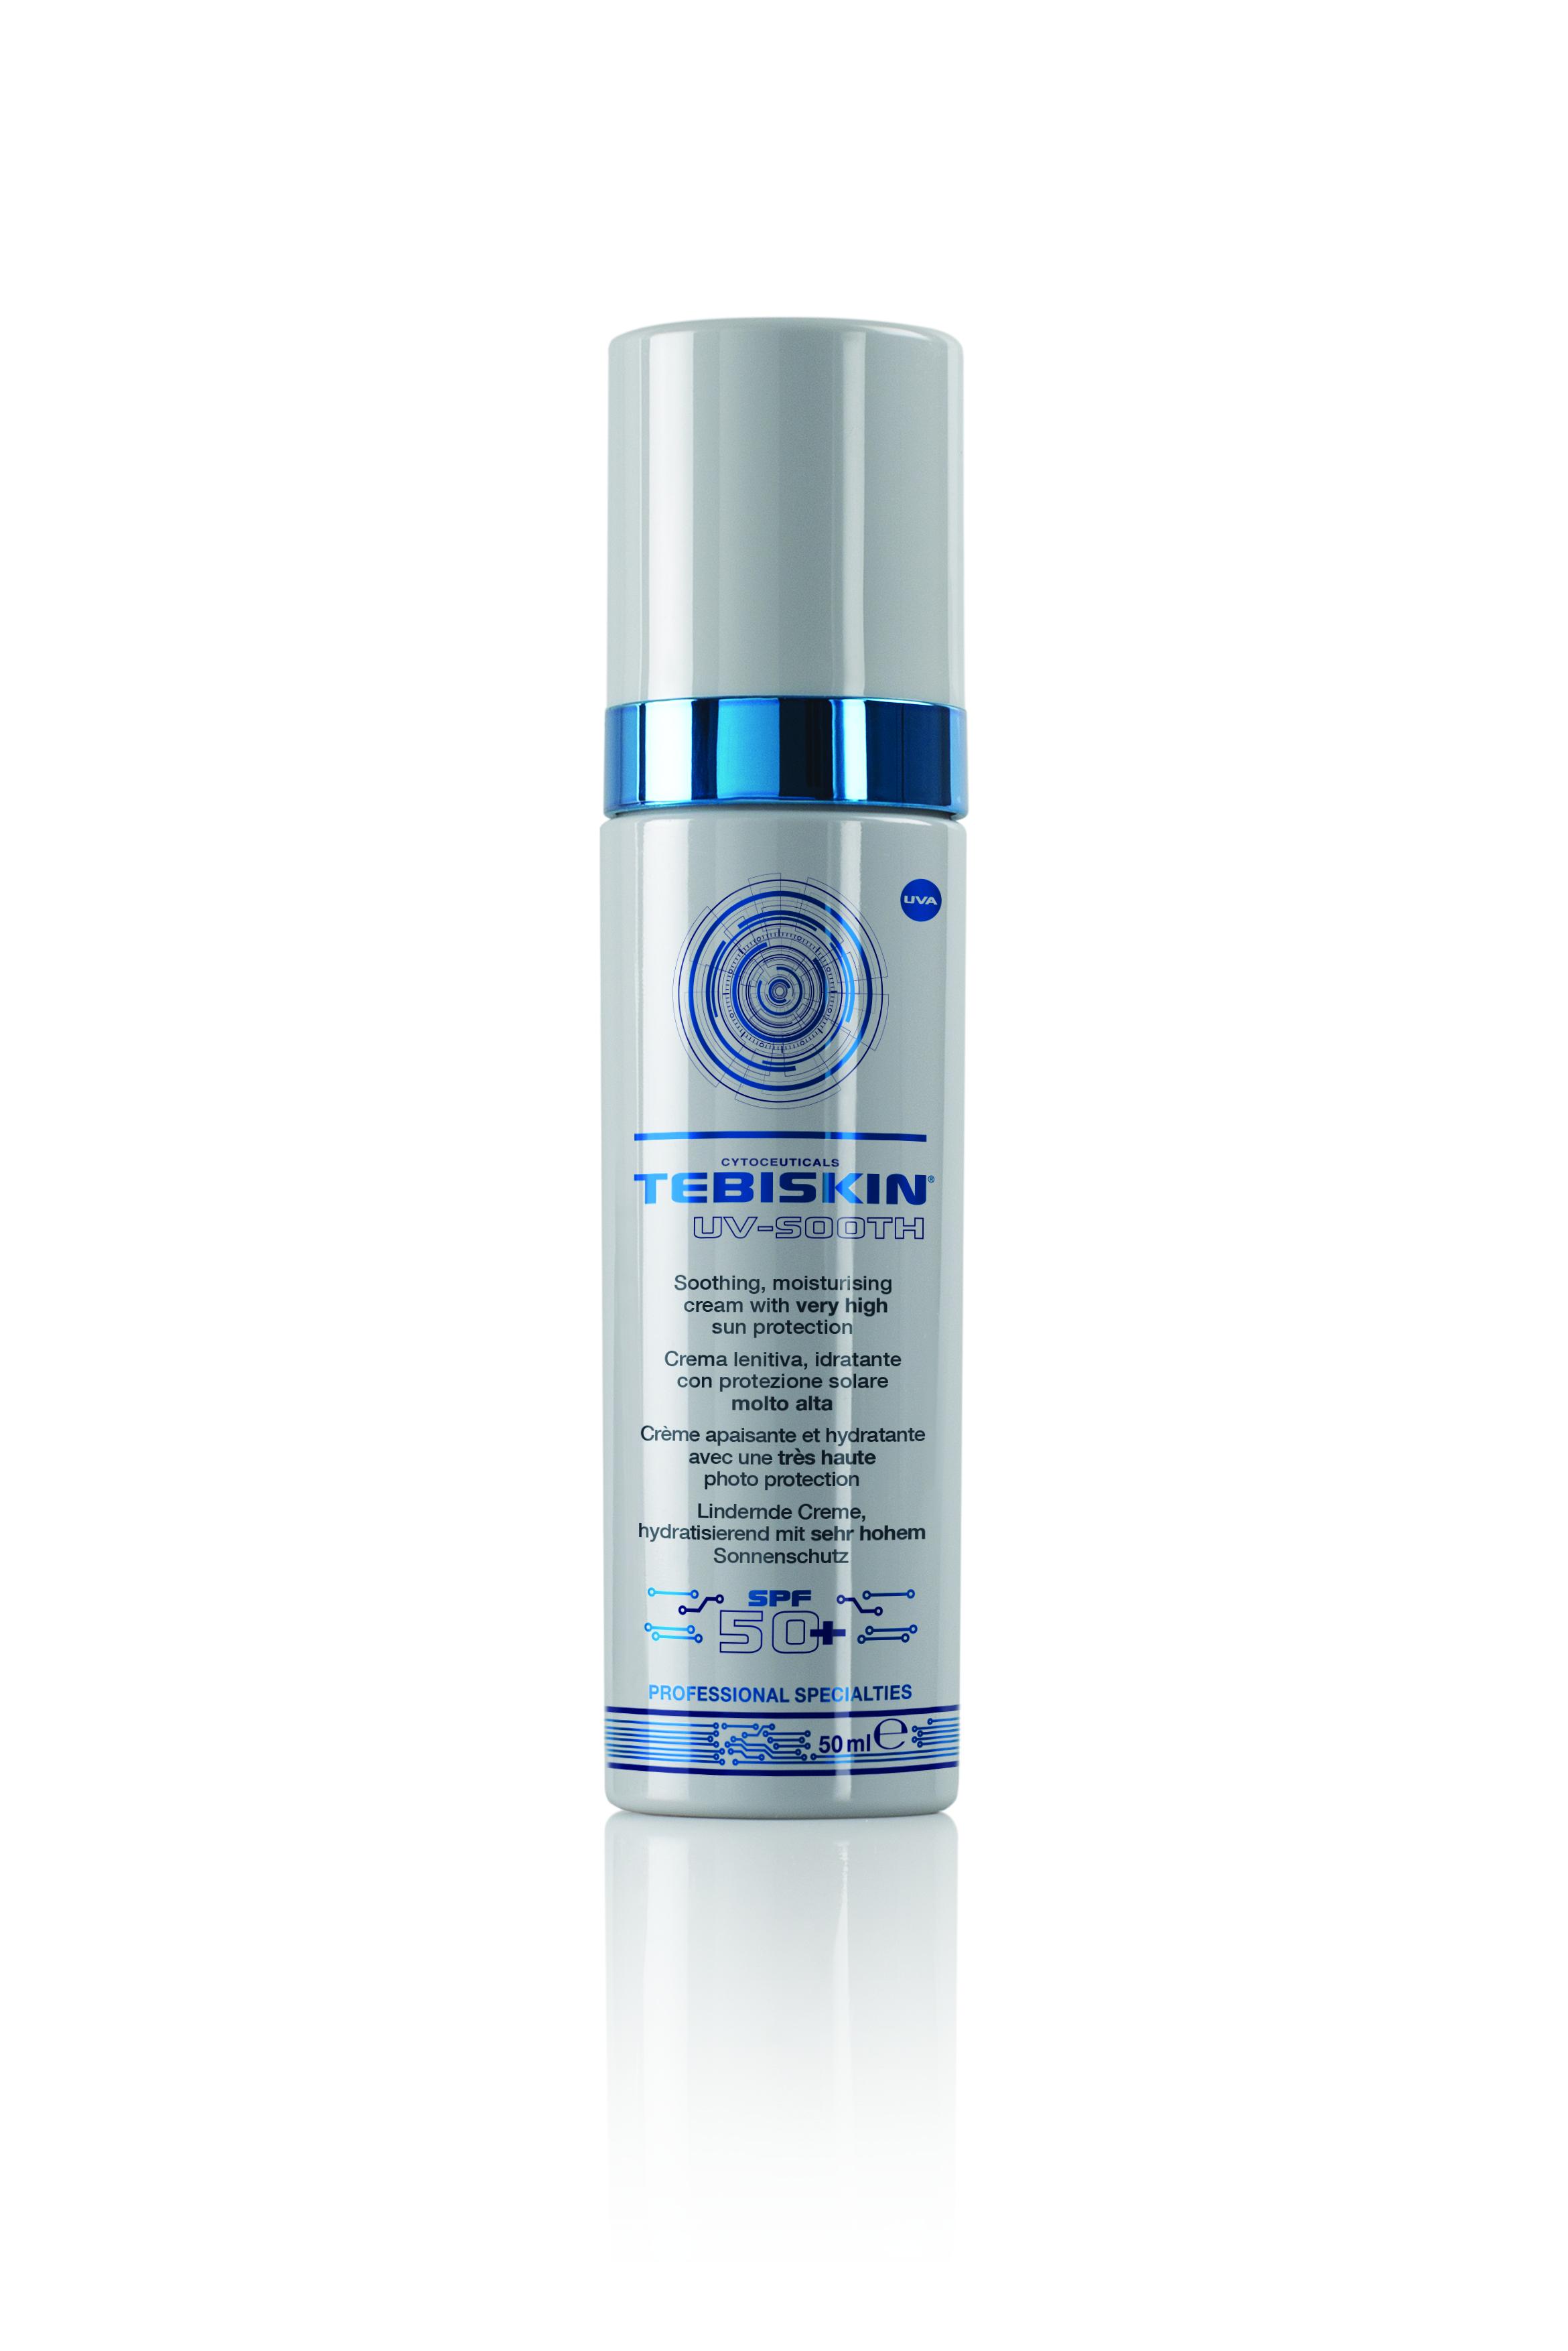 Tebiskin UV-Sooth SPF 50+ по специальной цене